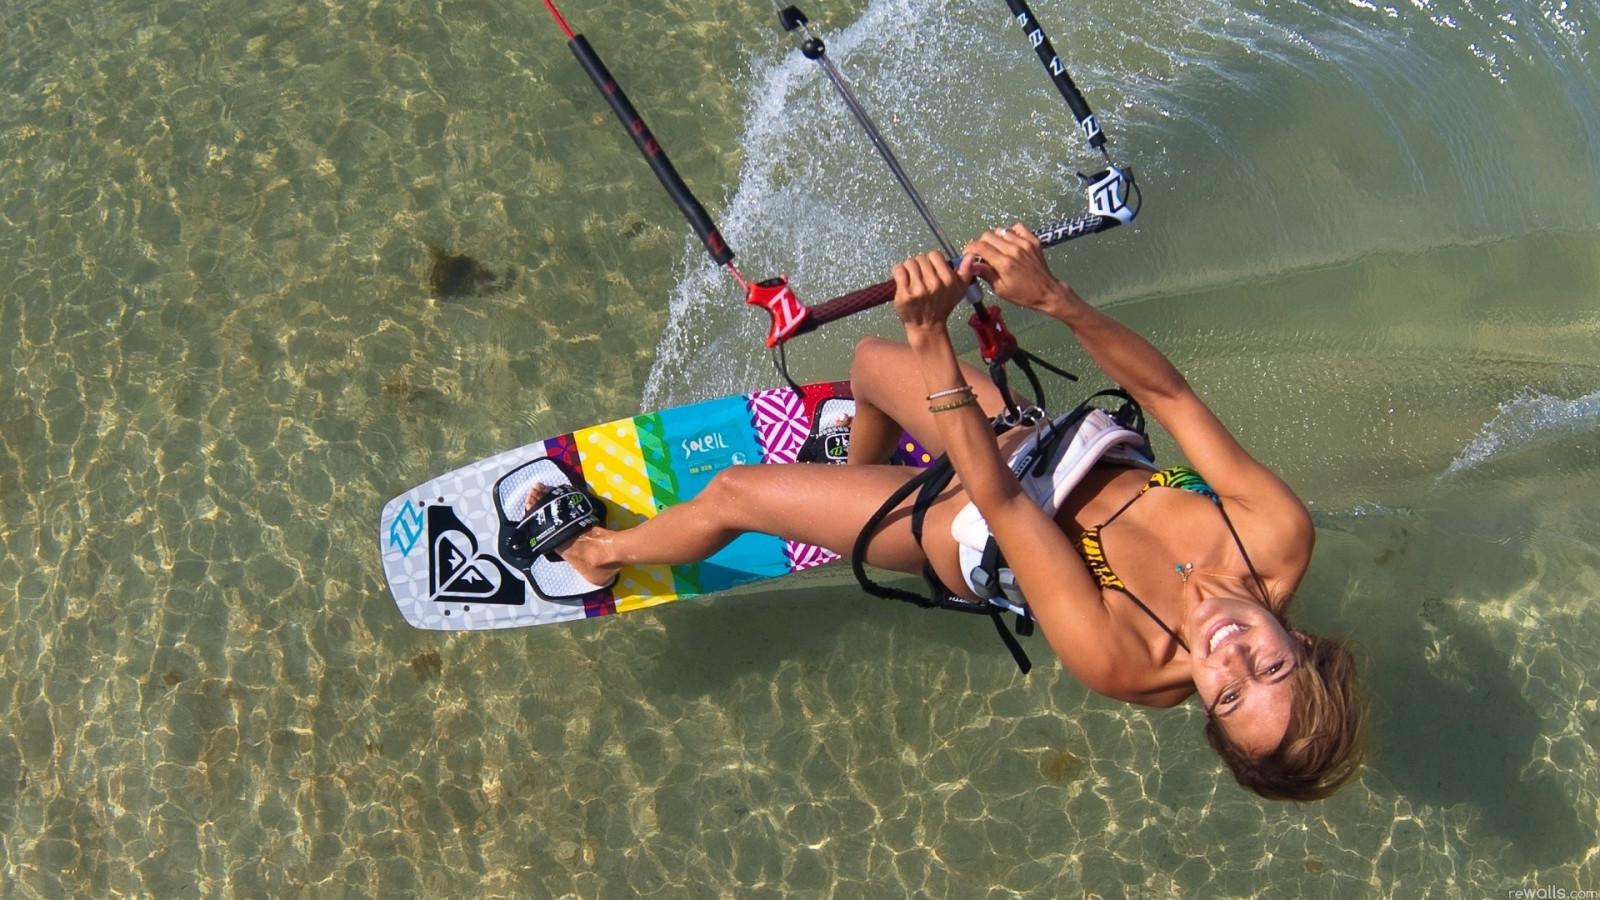 extreme sports not hazard